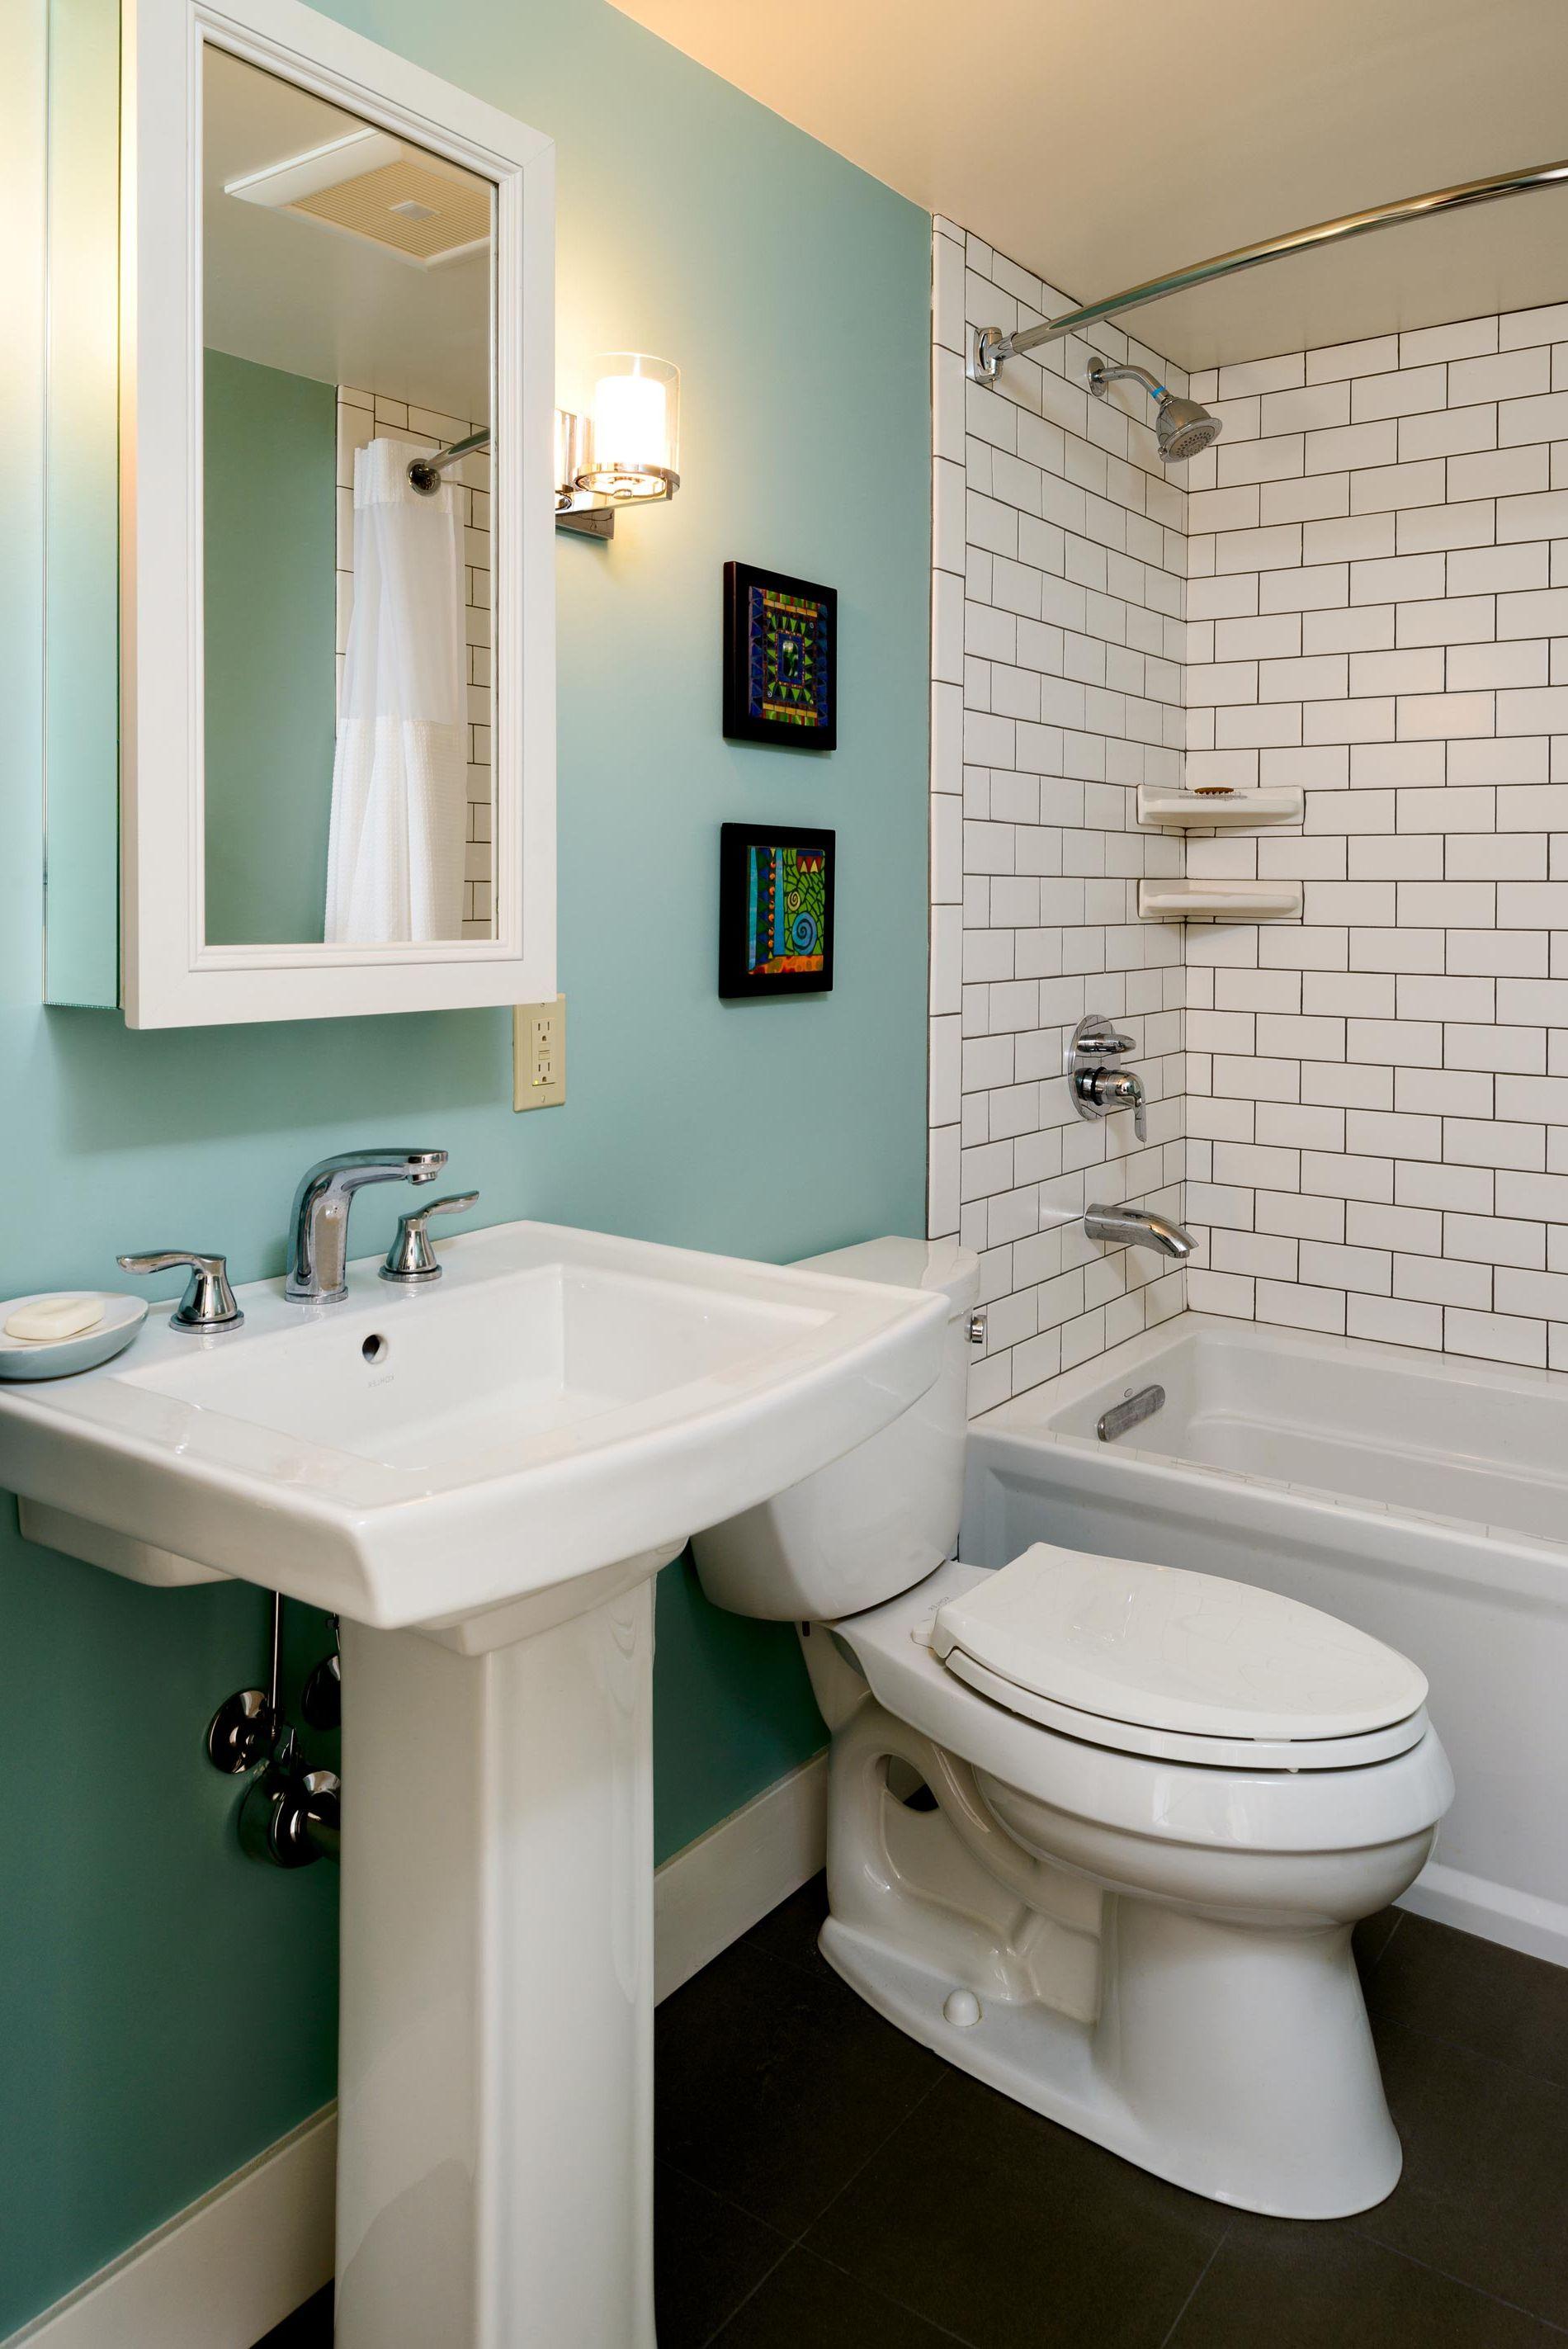 tile wainscoting in bathroom photo - 1